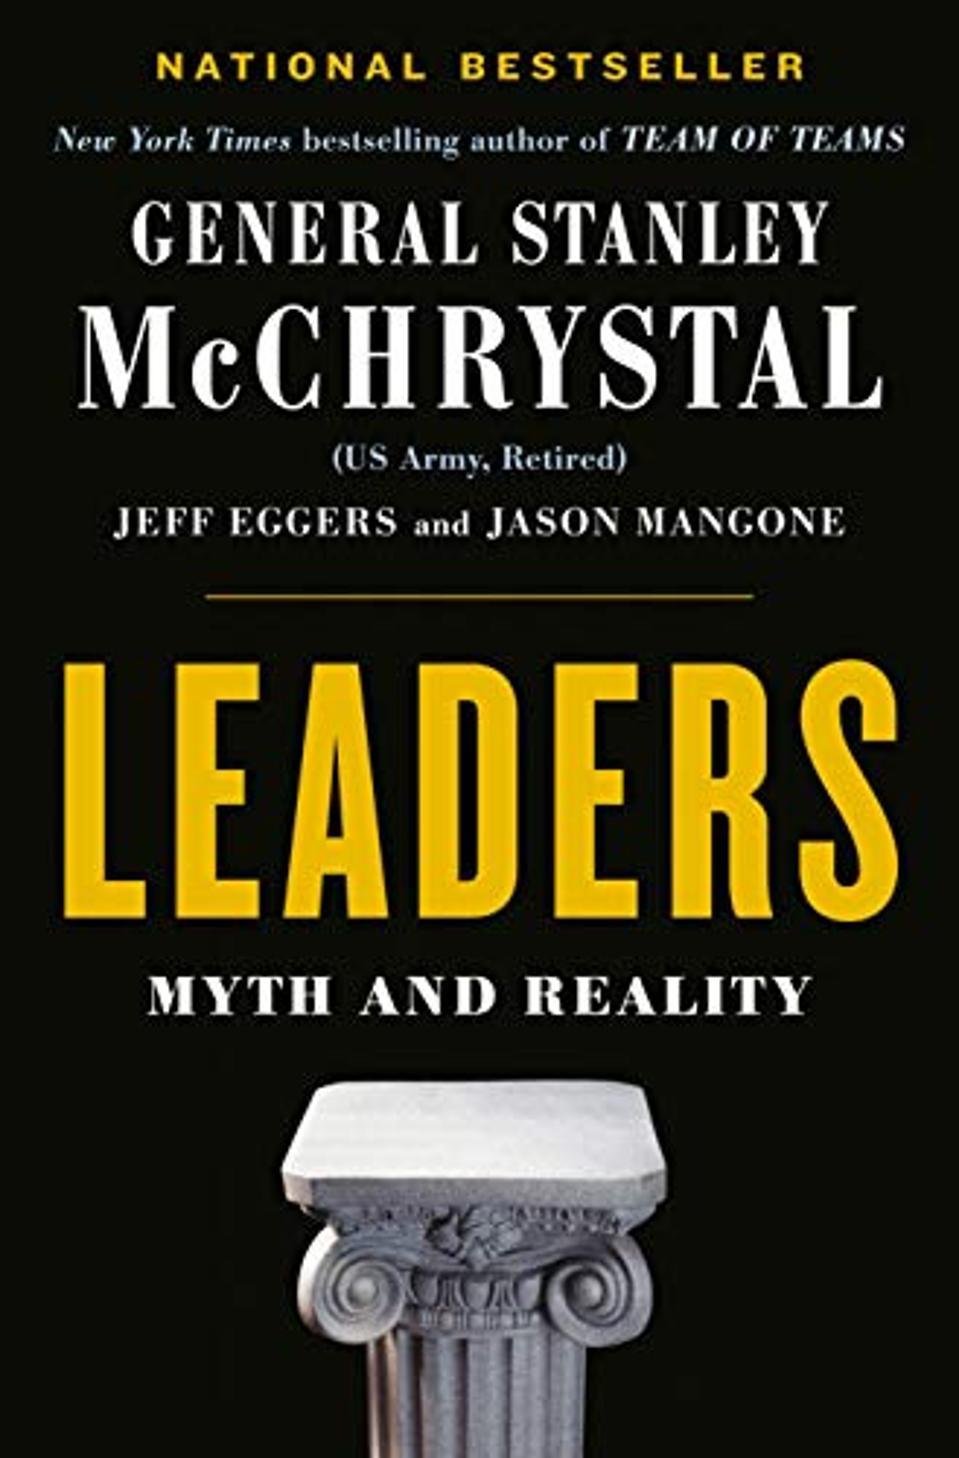 Stanley McChrystal's latest book